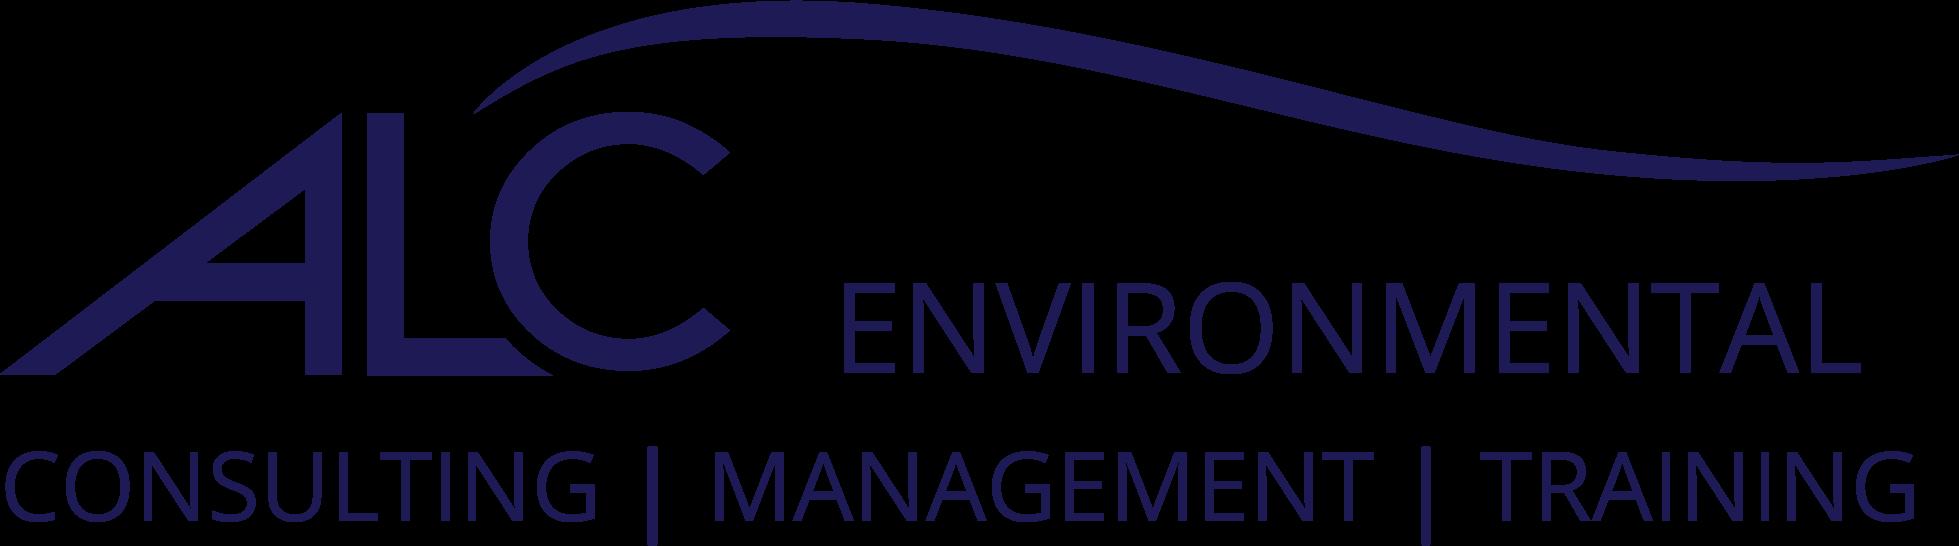 ALC Environmental